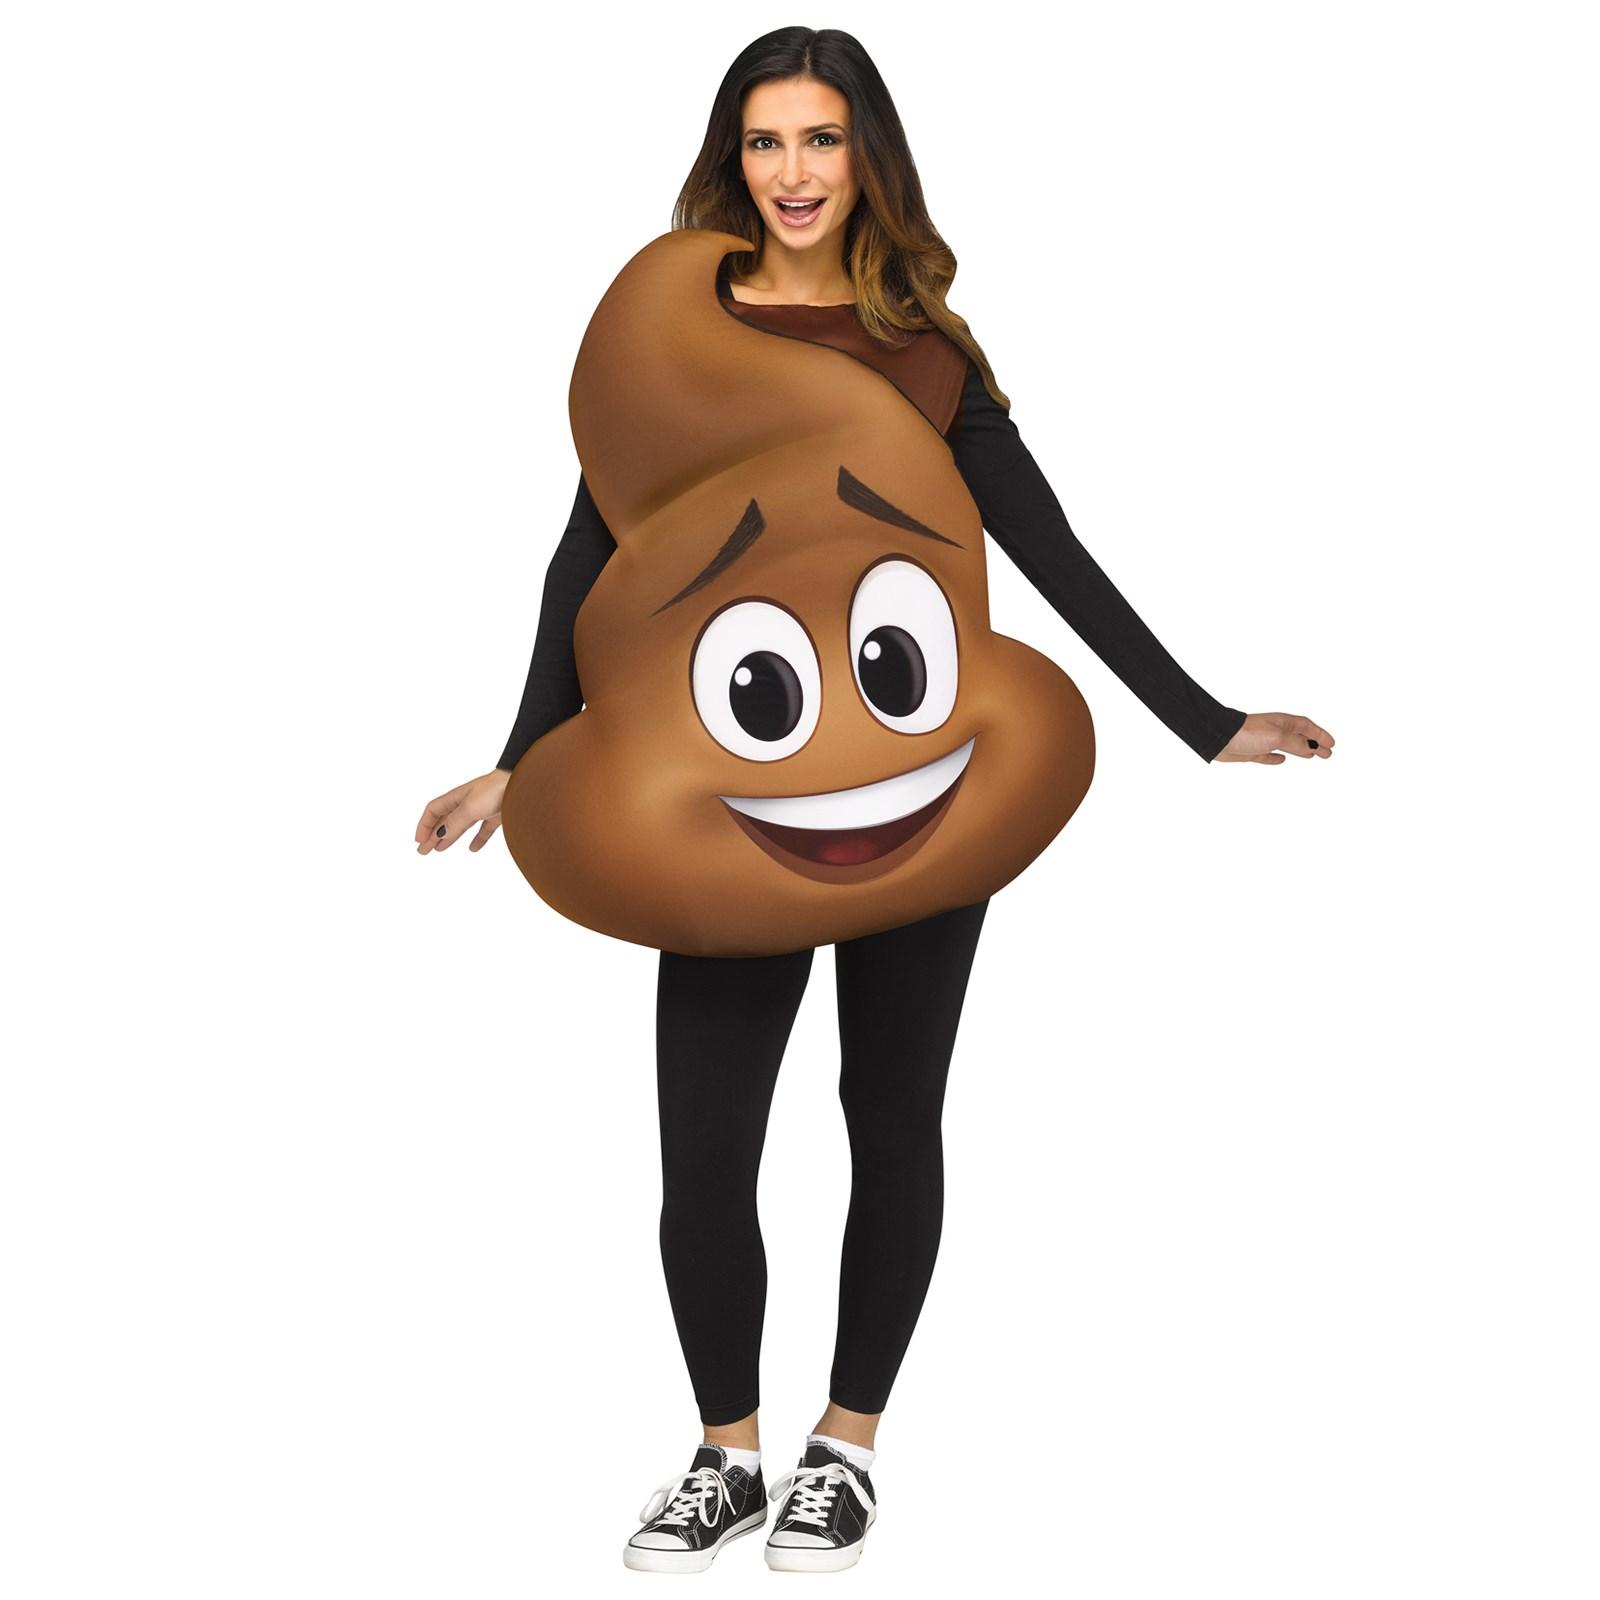 Spirit Halloween: Adult Poop Emoji Inflatable Costume Only ...